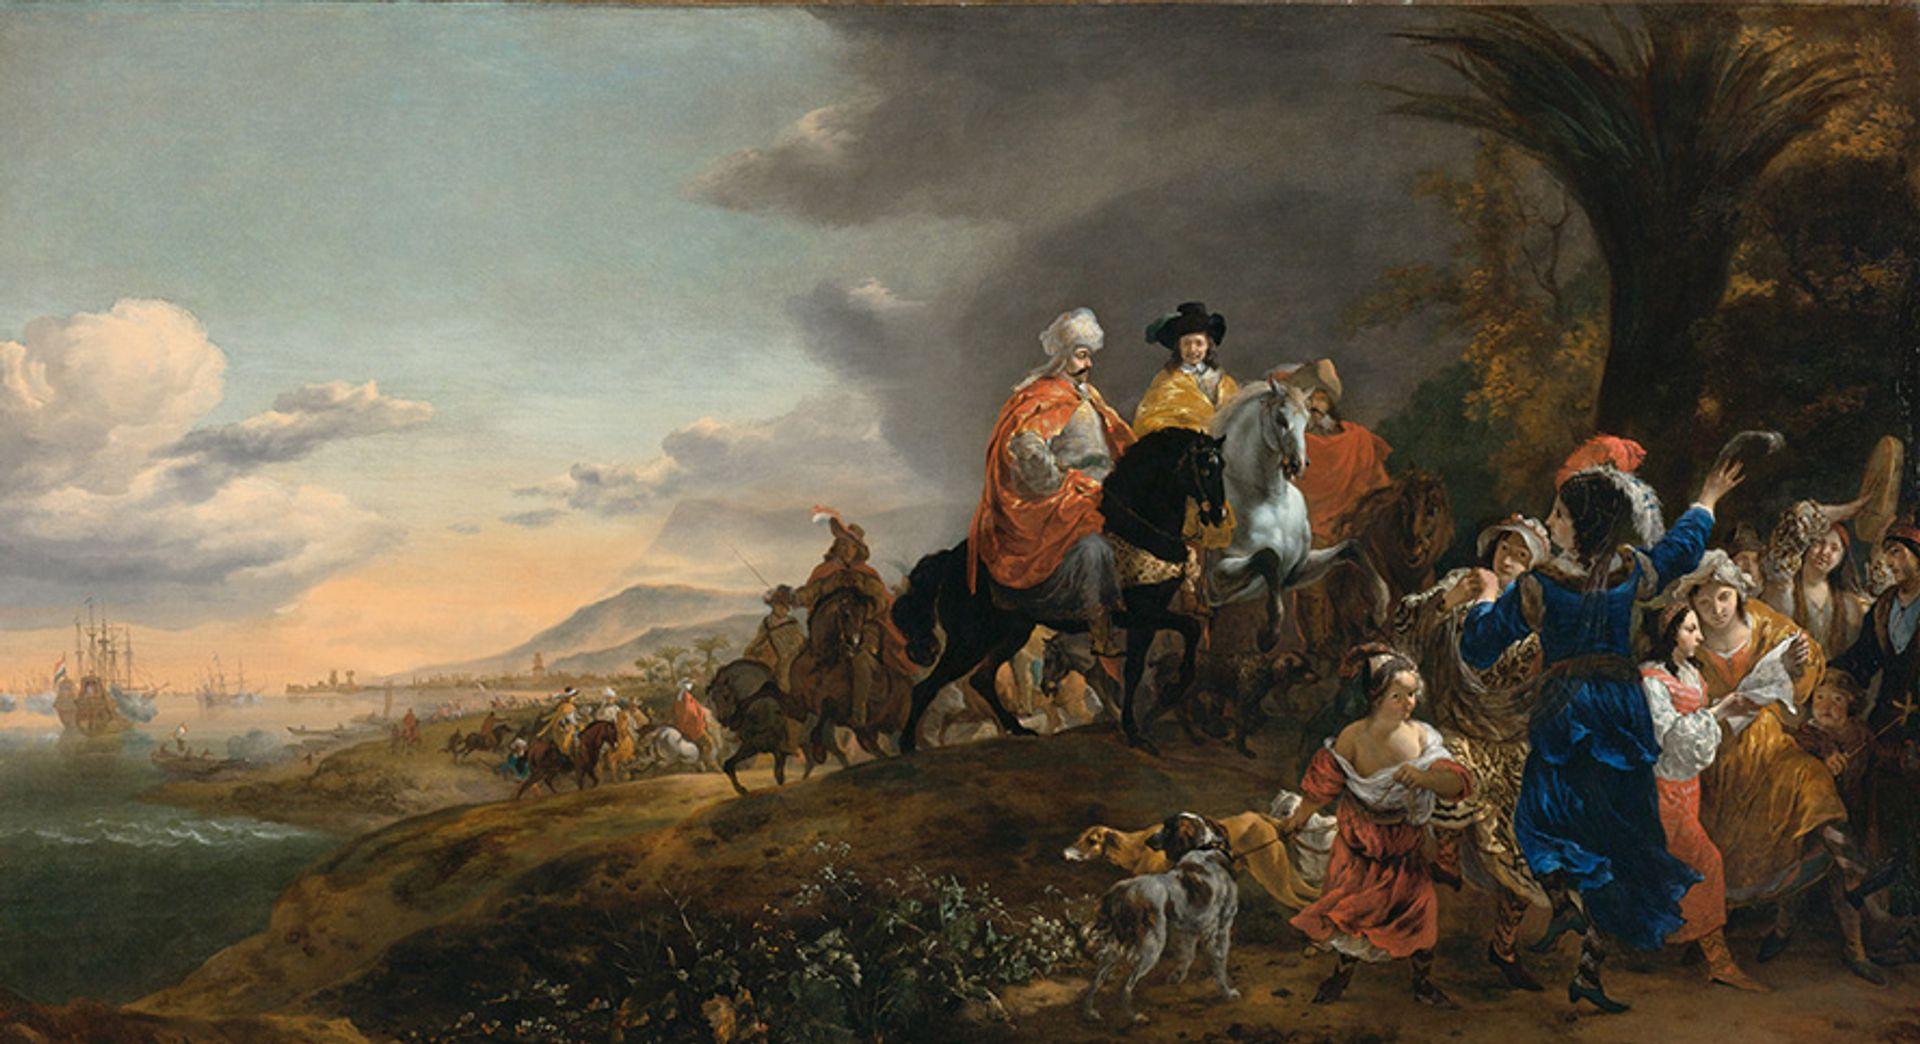 Jan Baptist Weenix, The Dutch Ambassador on his Way to Isfahan, 1653-54 Courtesy of the Rijksmuseum, Amsterdam